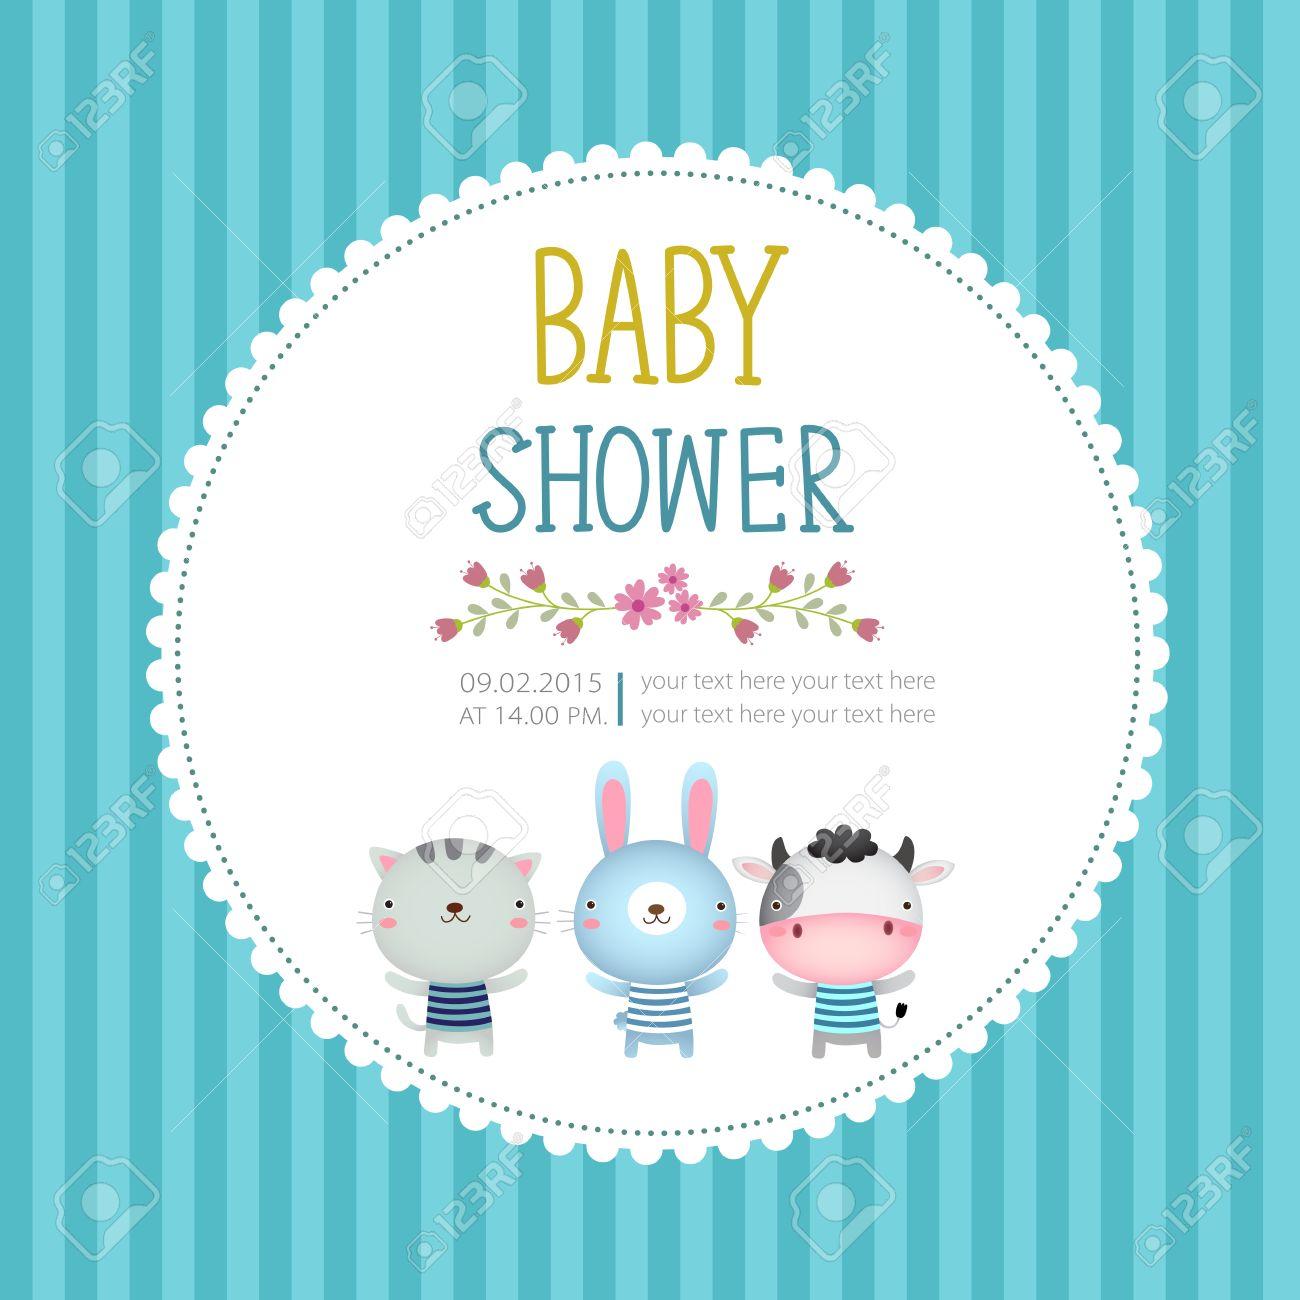 Illustration of baby shower invitation card template on blue illustration of baby shower invitation card template on blue background stock vector 45761265 filmwisefo Images